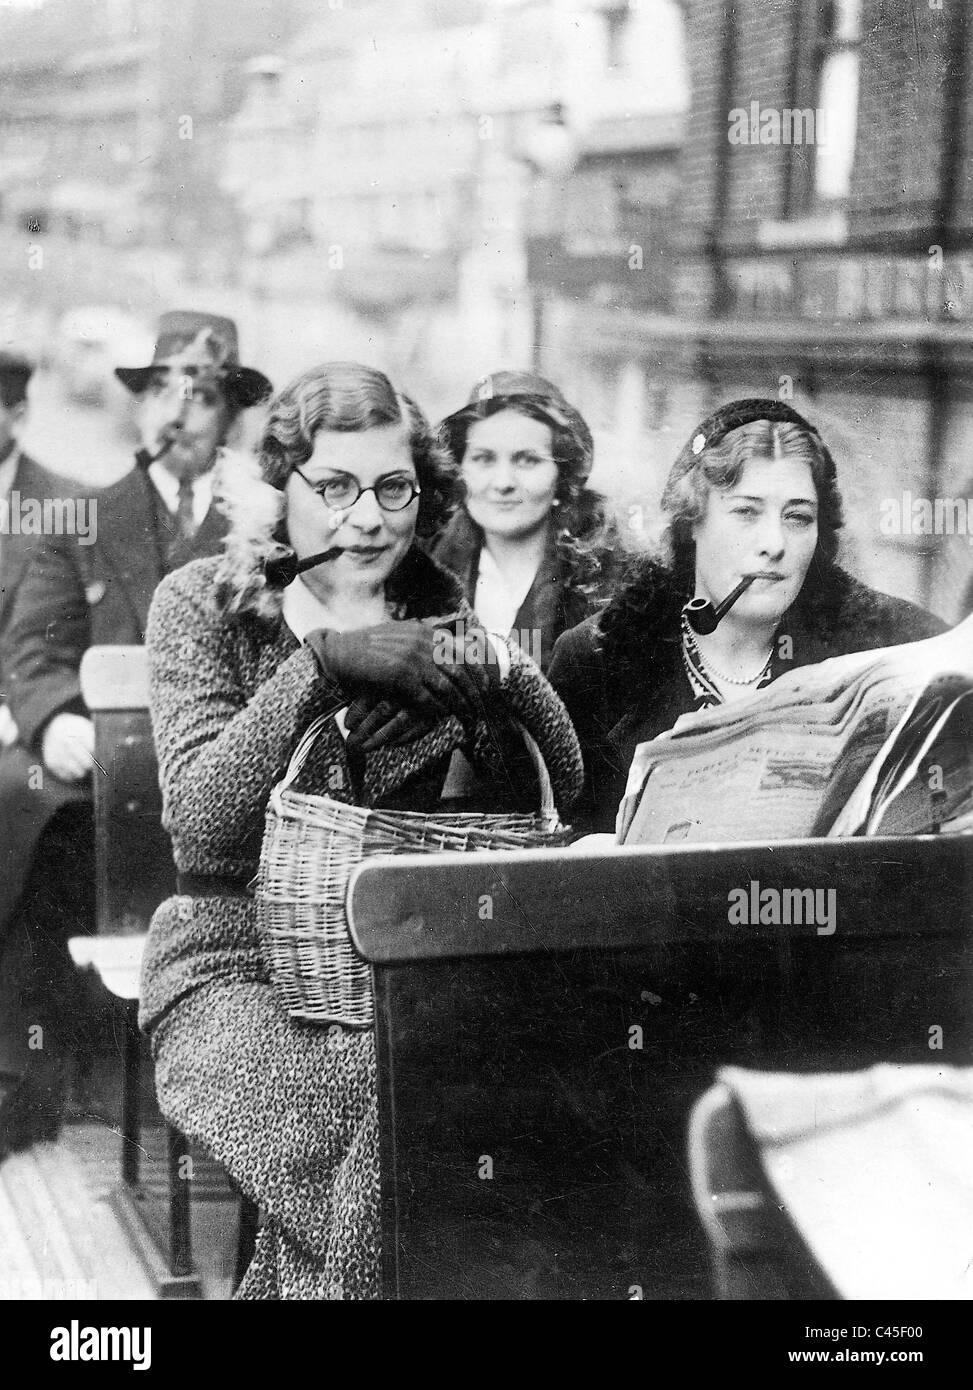 Smoking women, 1936 - Stock Image